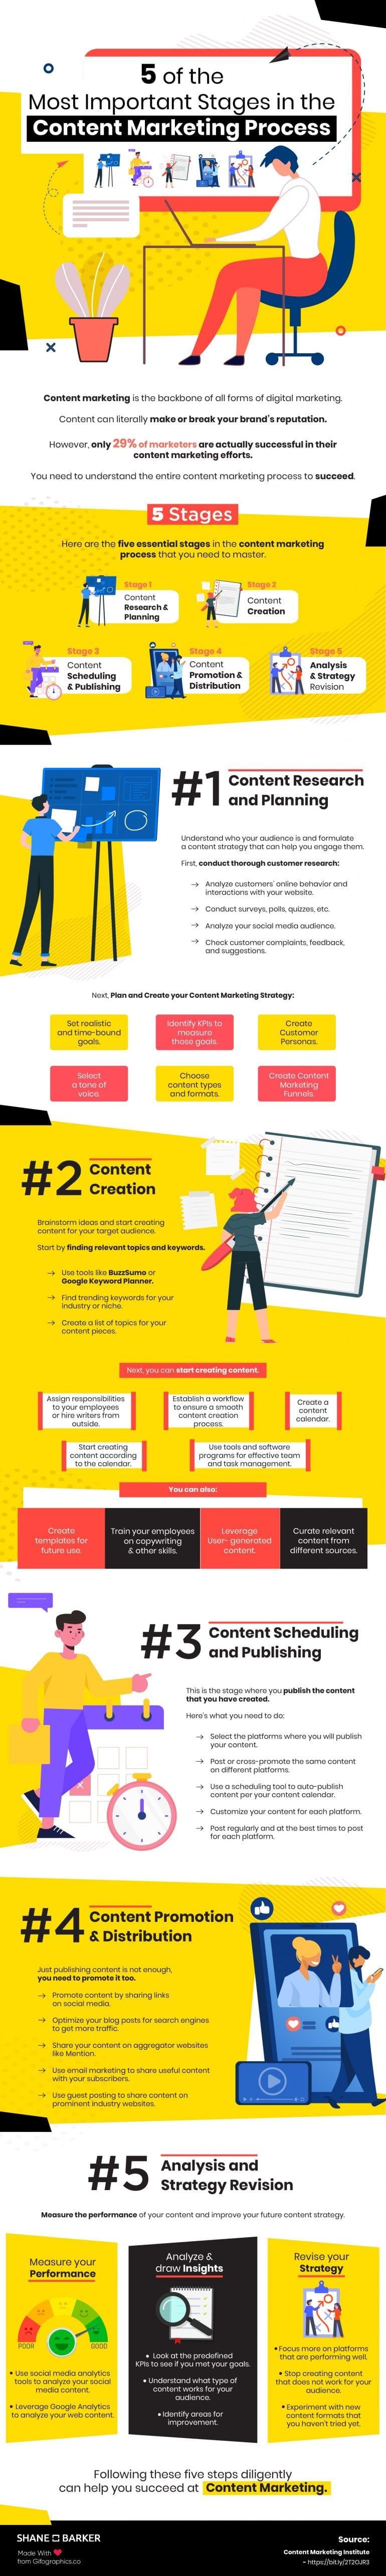 Proces contentmarketing